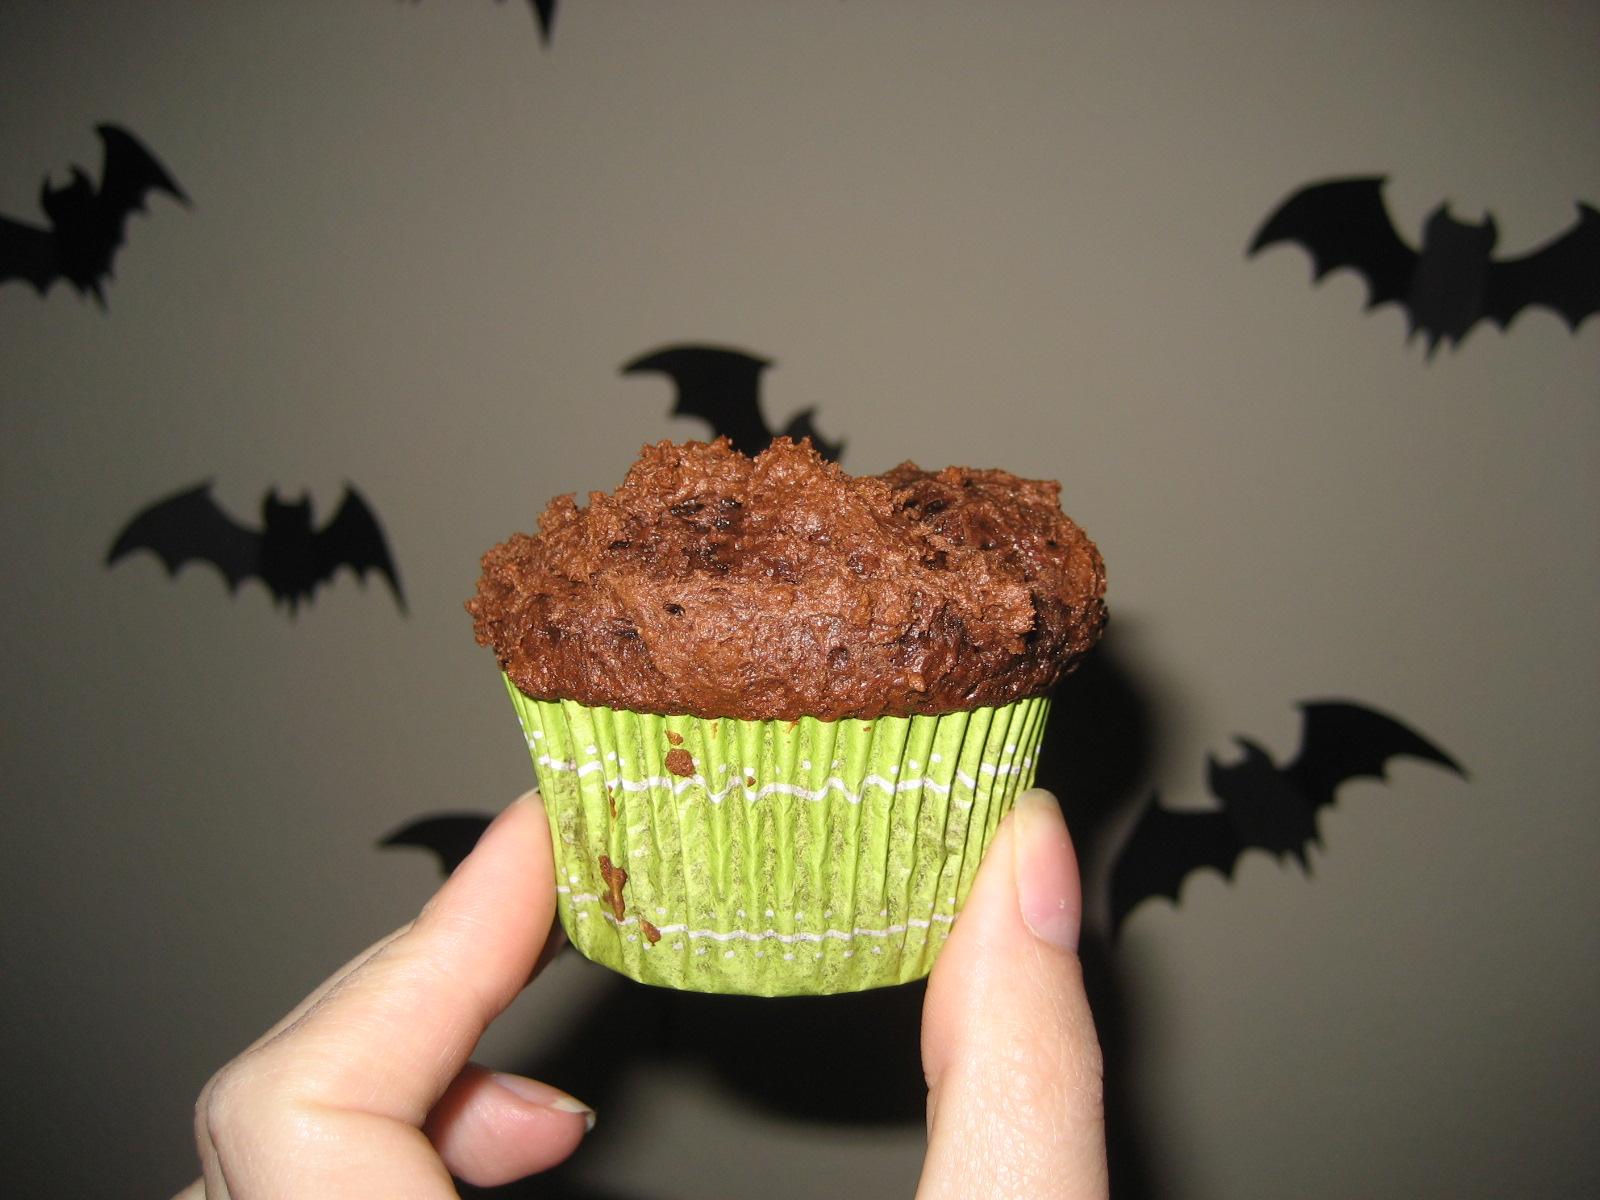 http://heckfridays.blogspot.com/2011/10/easy-healthy-chocolate-cupcakes.html